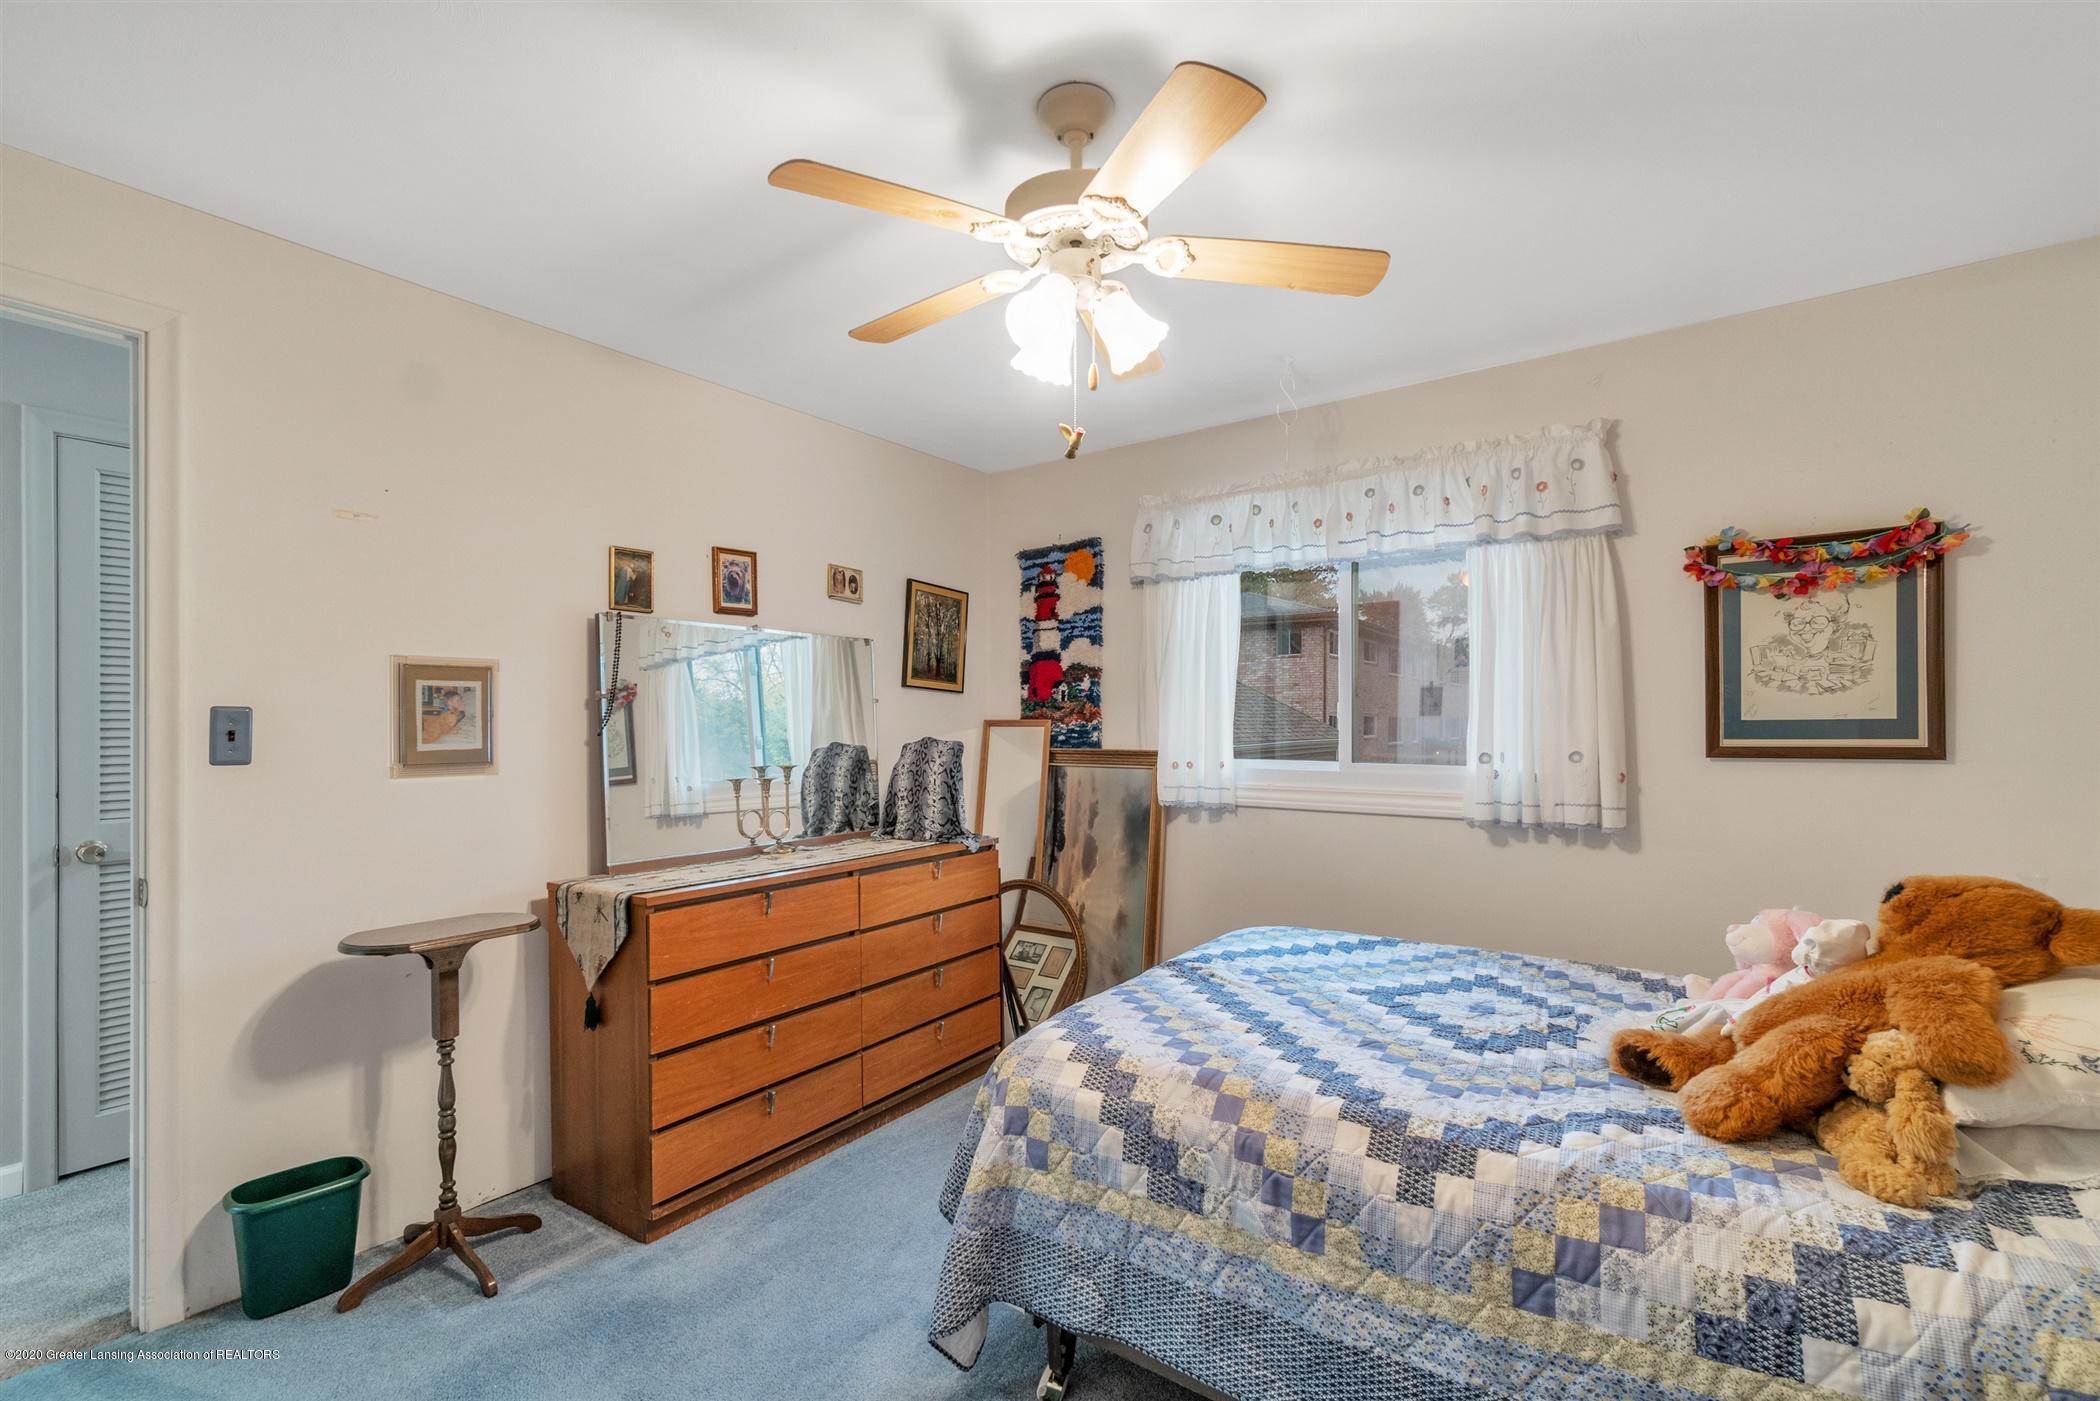 4385 Holt Rd - 25-4385 Holt Rd.-WindowStill-Real-E - 25